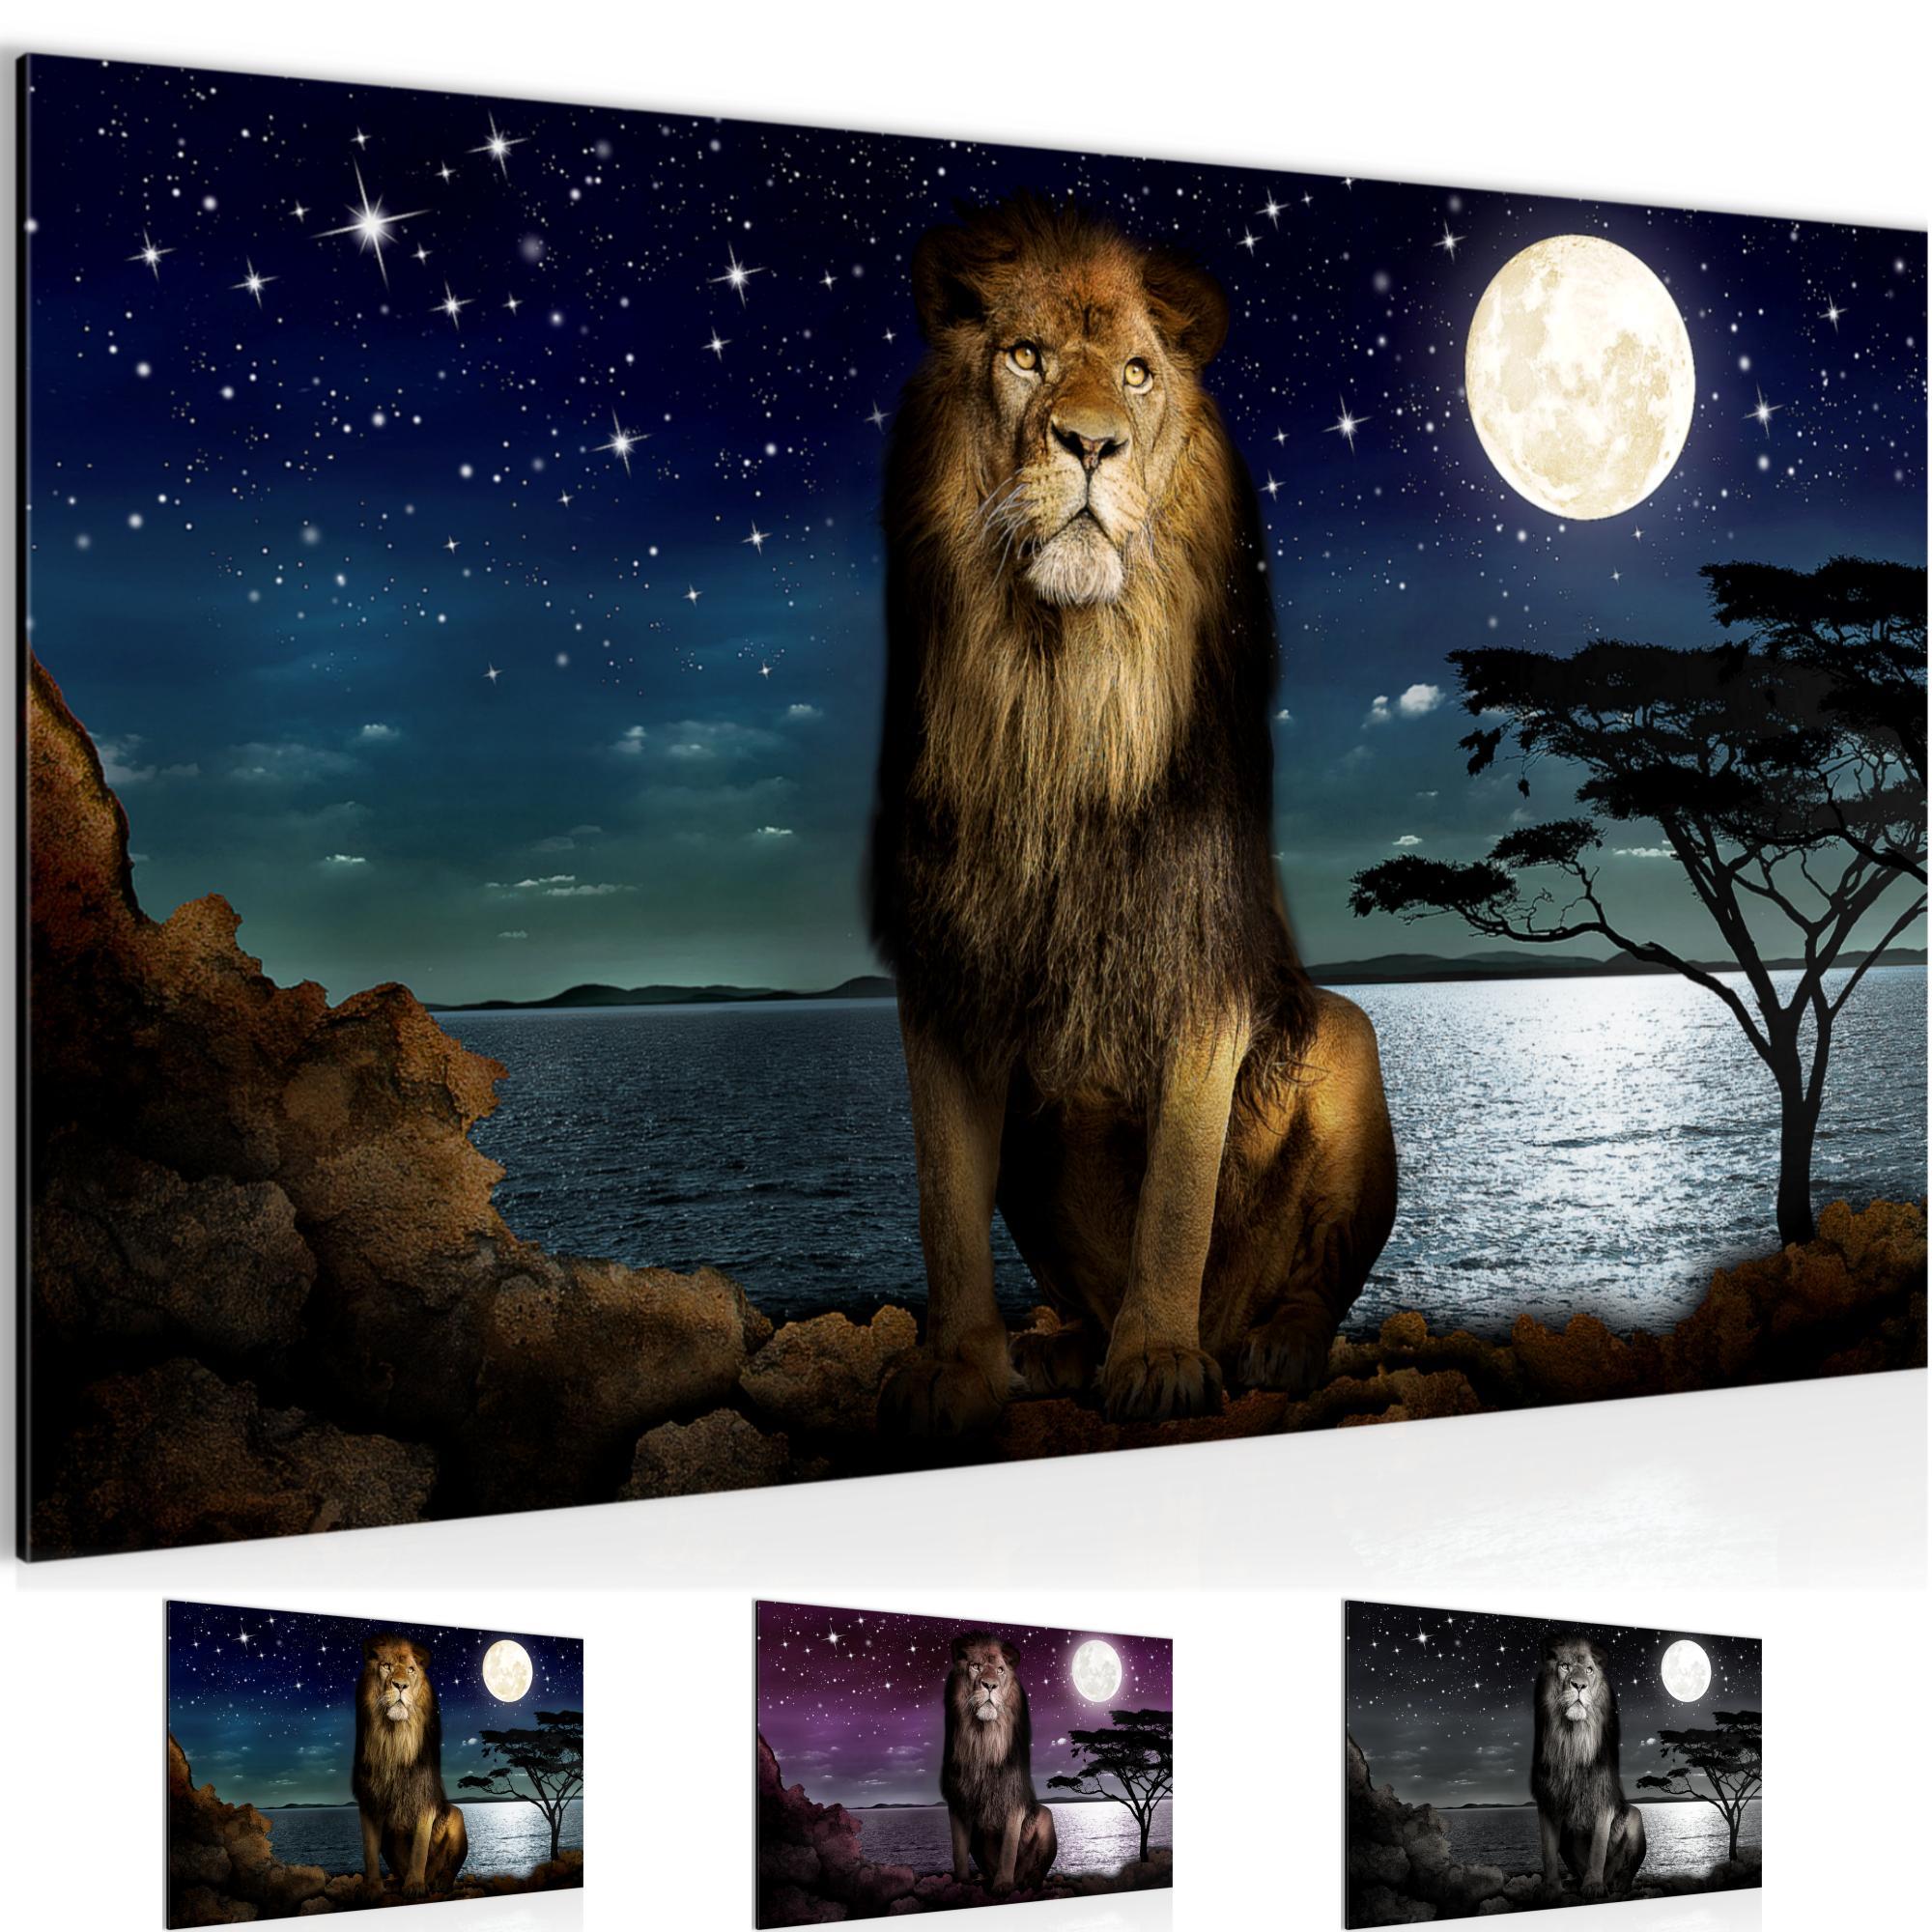 Afrika l we bild kunstdruck auf vlies leinwand xxl dekoration 022914p - Dekoration afrika ...